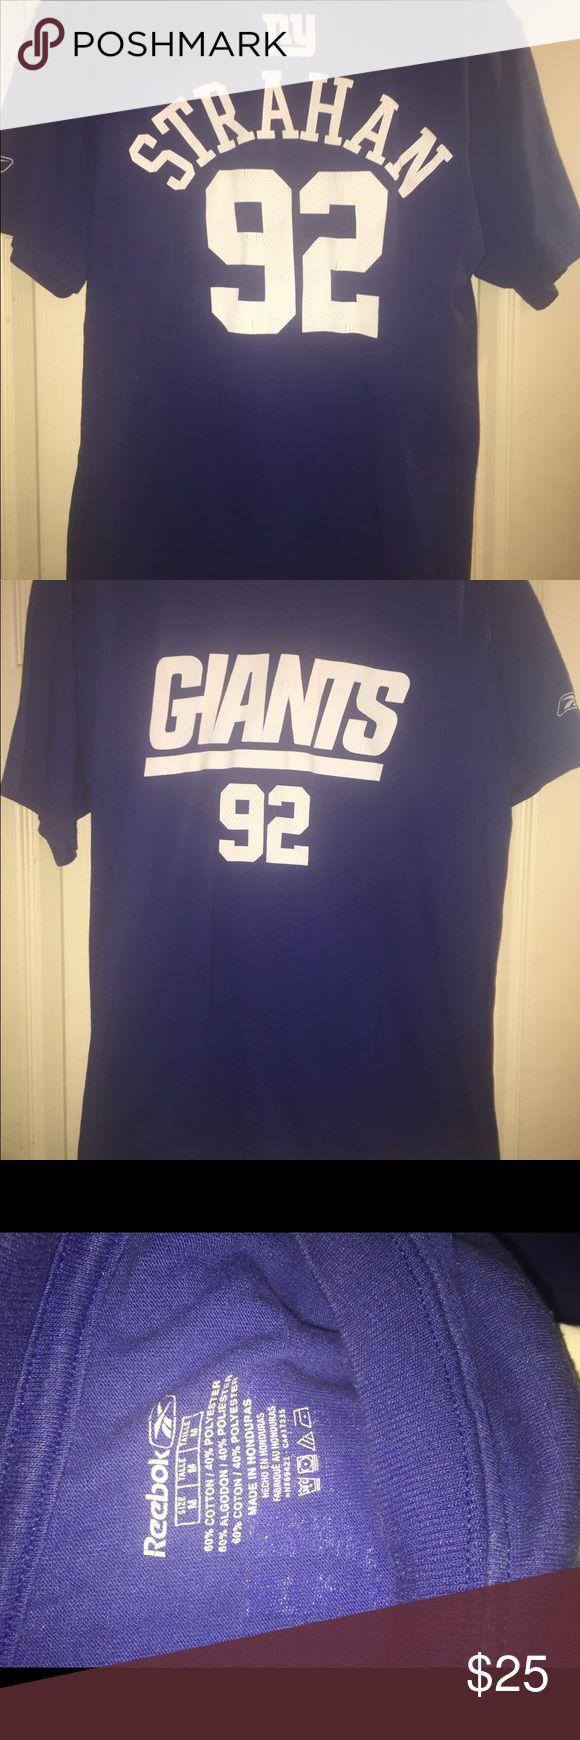 Men michael strahan New York giants tshirt tee m Men reebok michael strahan ny giants #92 size medium. Reebok Shirts Tees - Short Sleeve